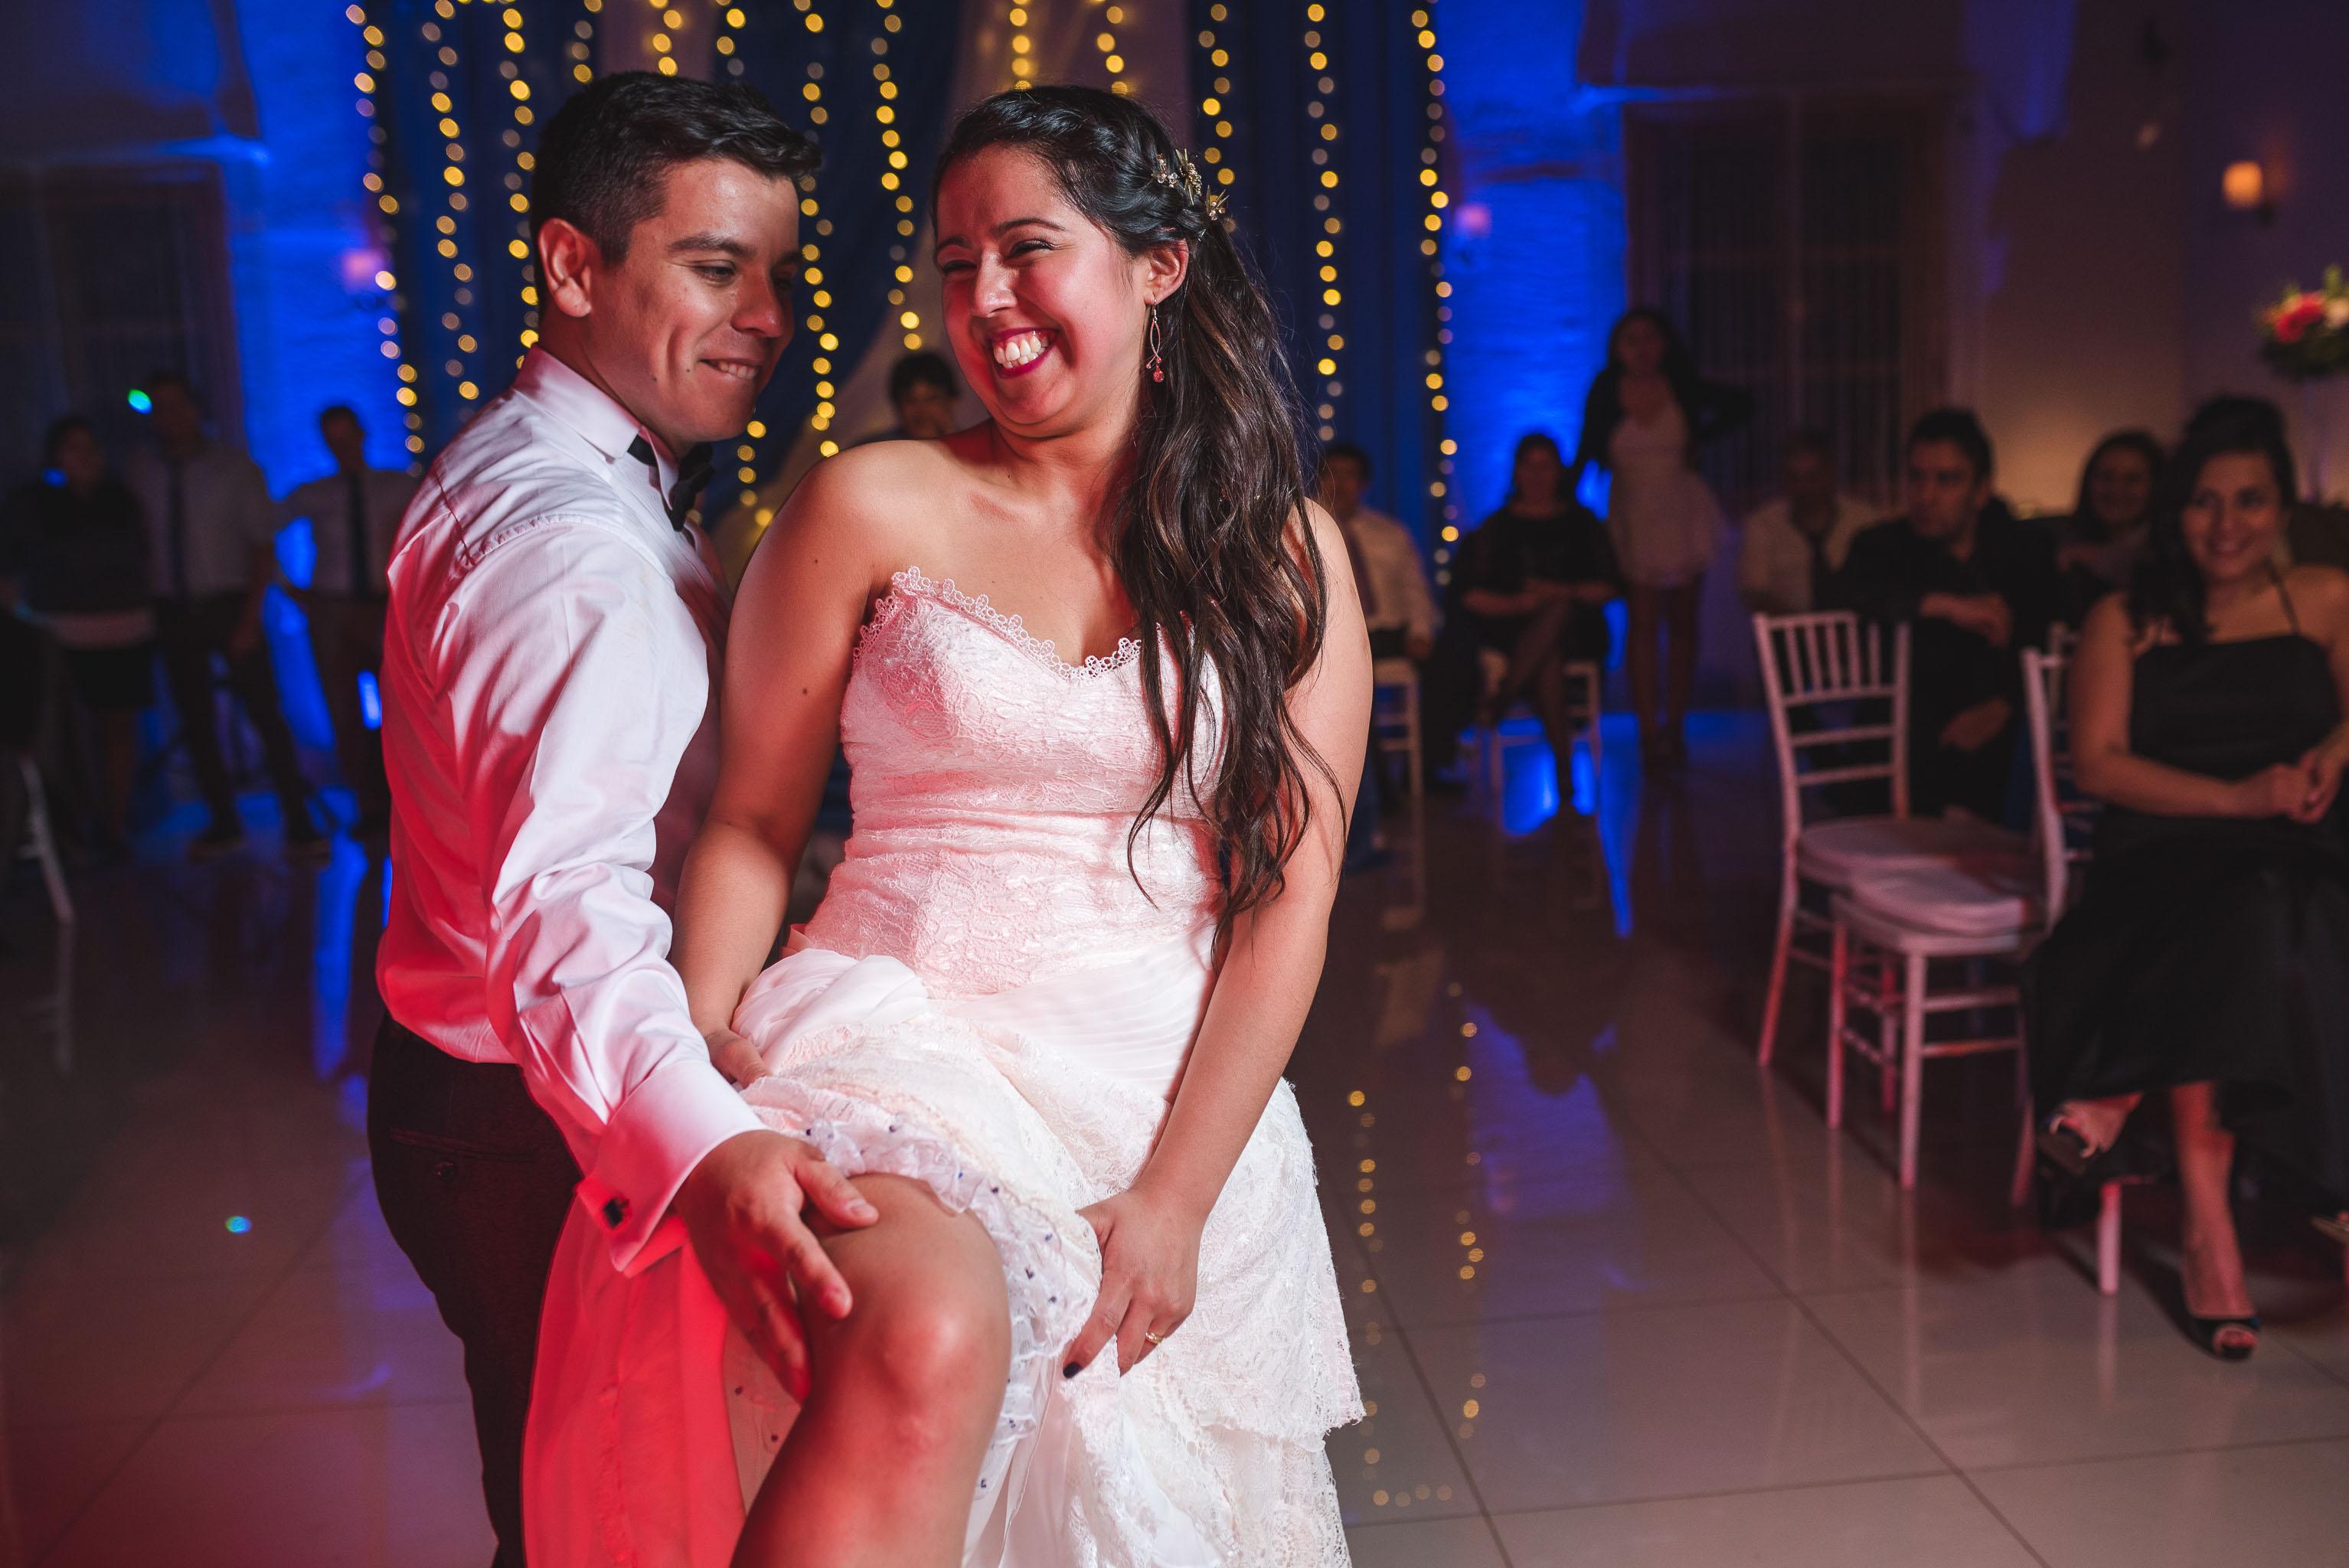 Matrimonio-centro de eventos-oliveto-santiago-fotógrafo de matrimonios-fiesta-liga